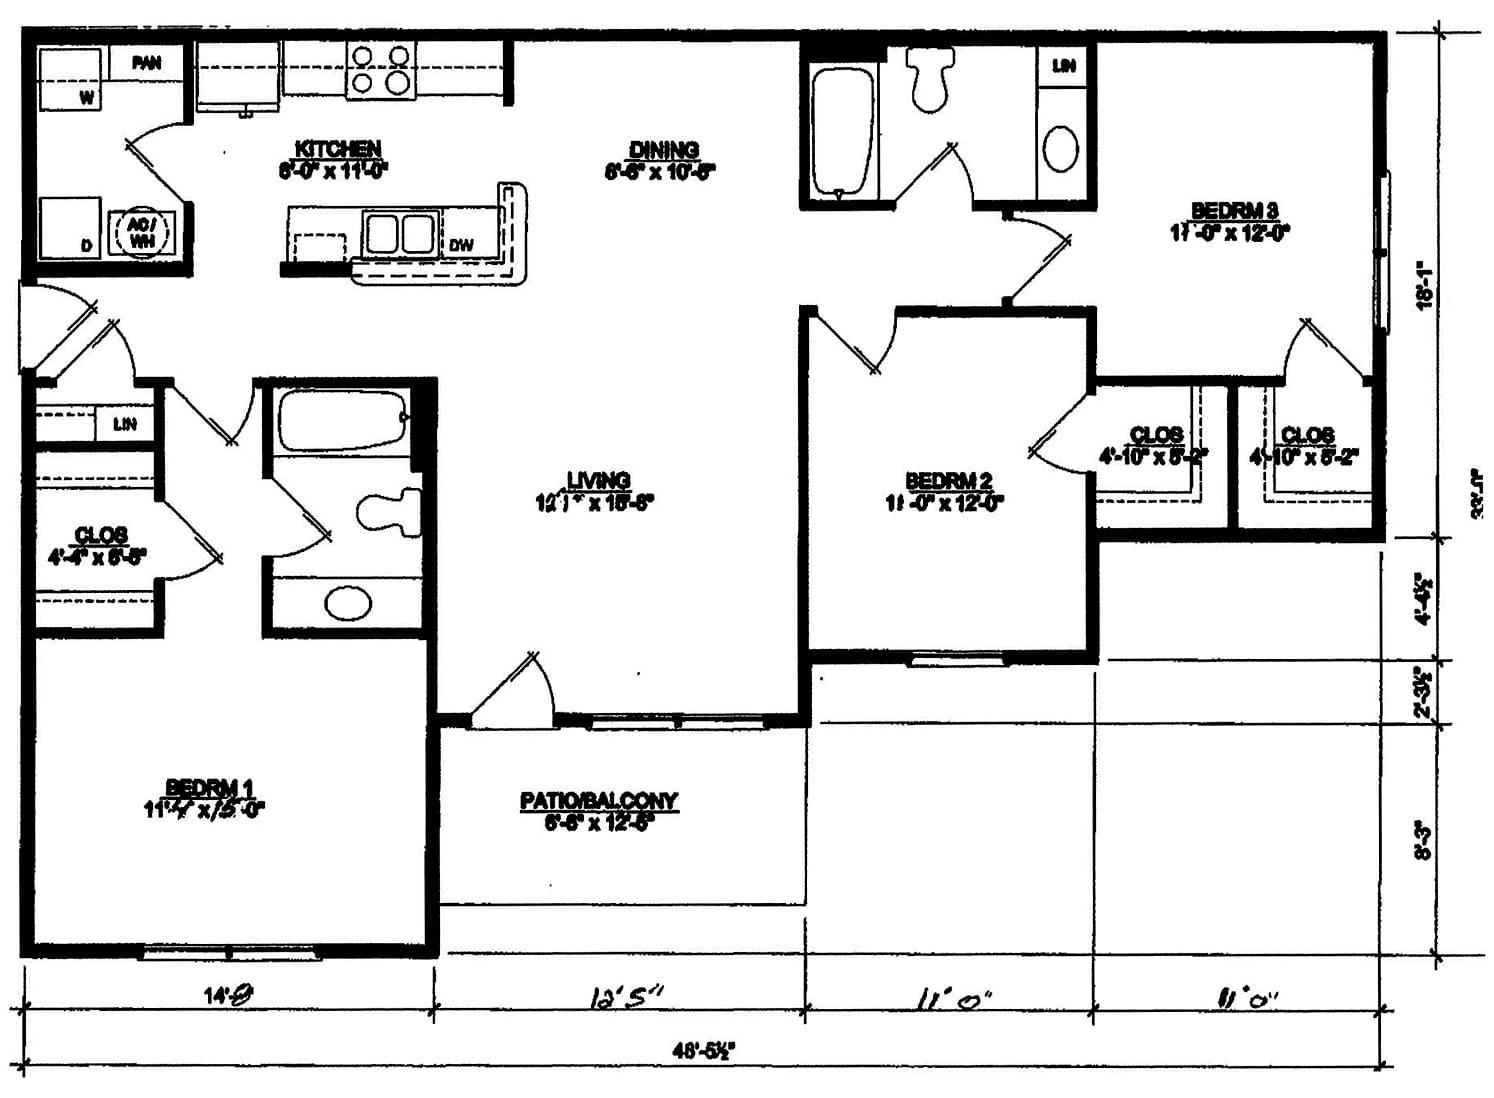 apartments | 3 bedroom apartment paducah | 3 bedroom apartment